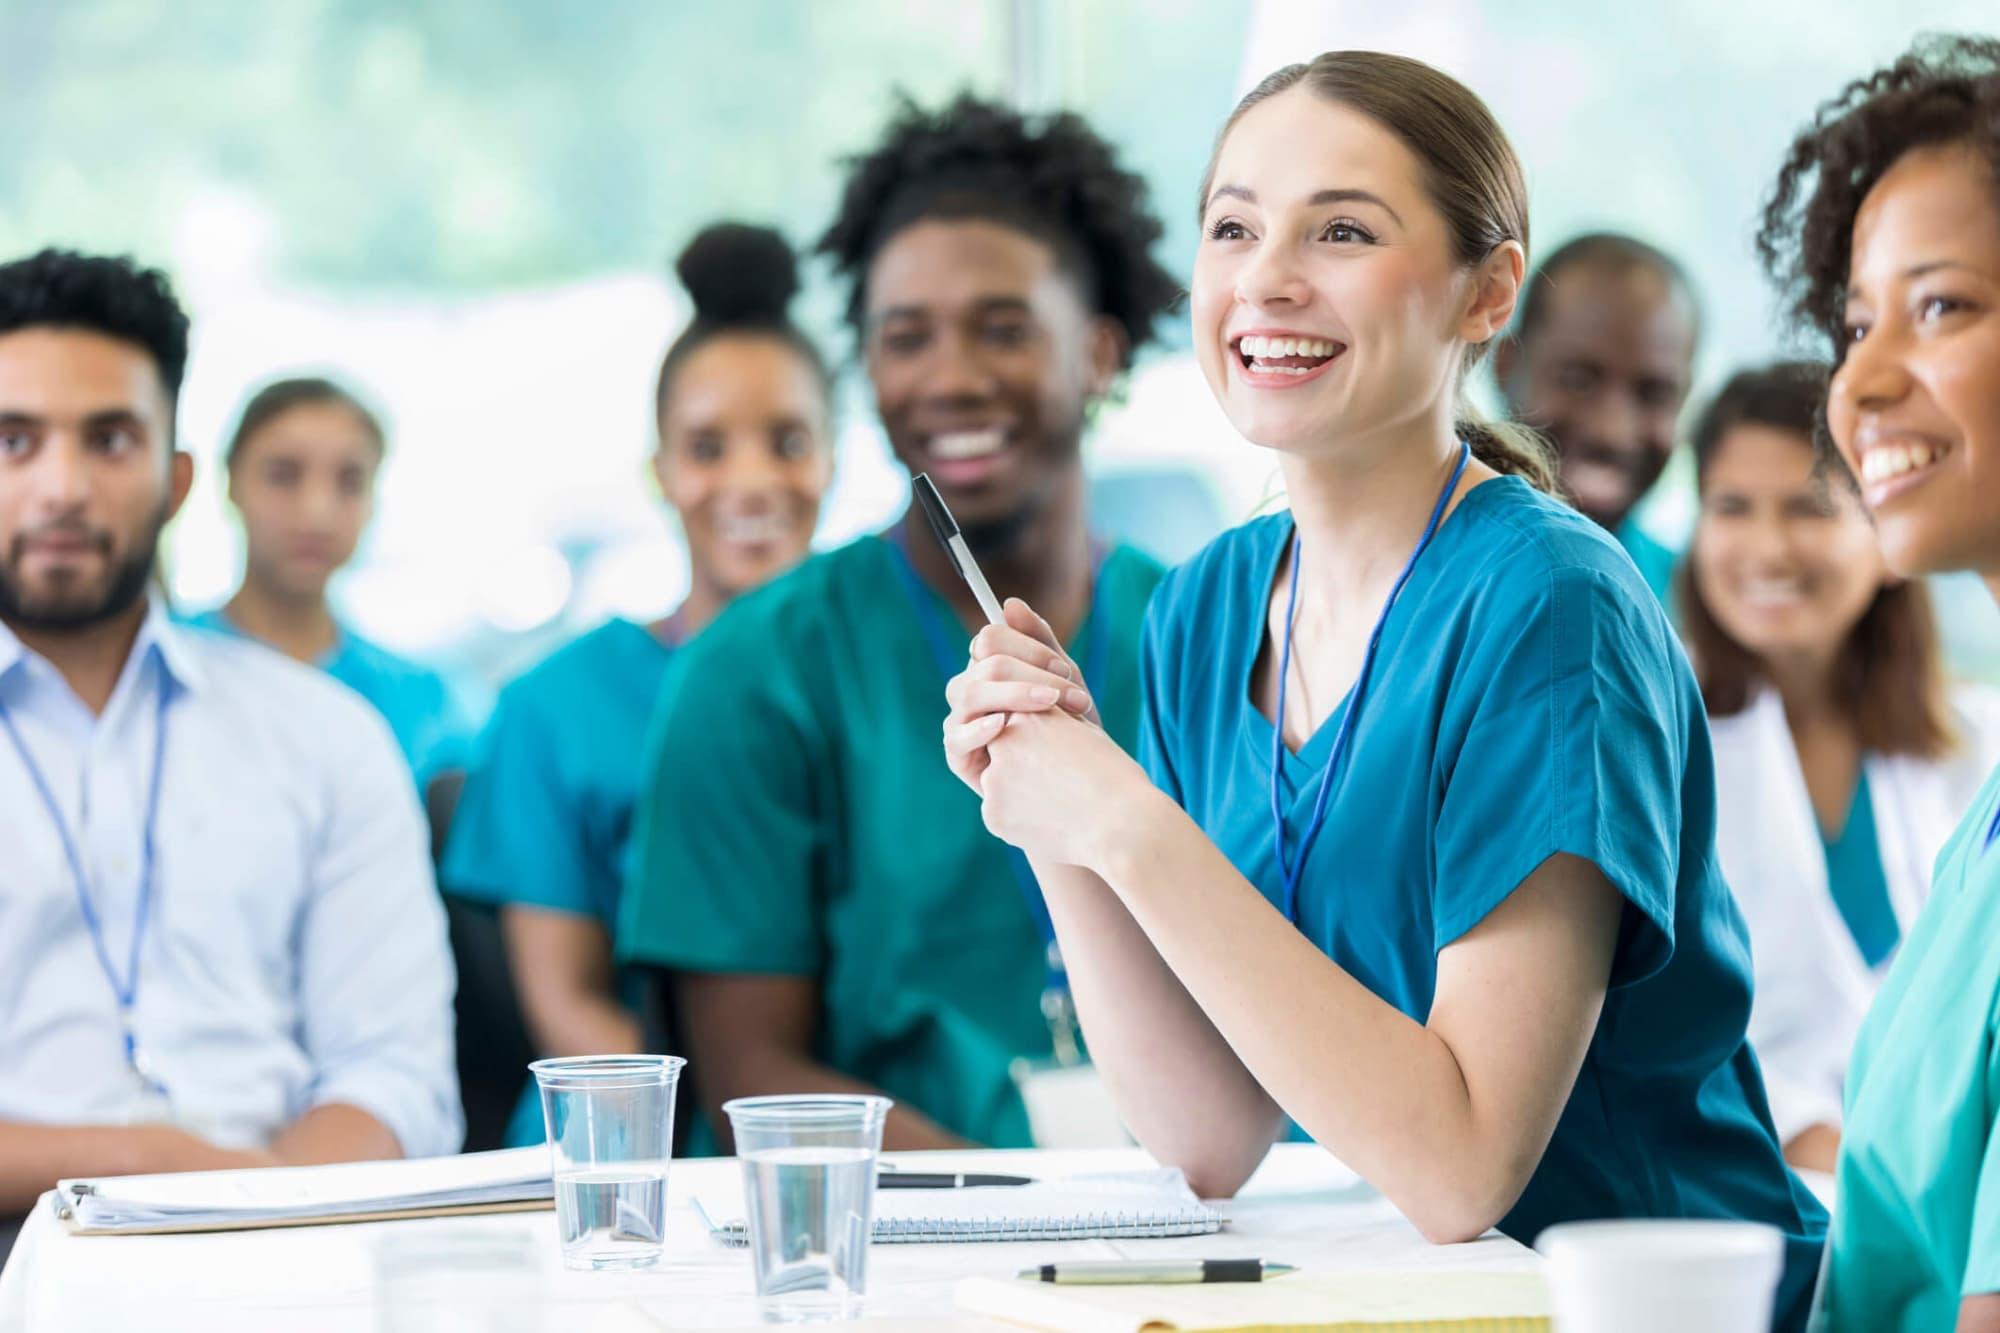 LPN Certificates vs Nursing Associate Degrees: How Do They Differ?